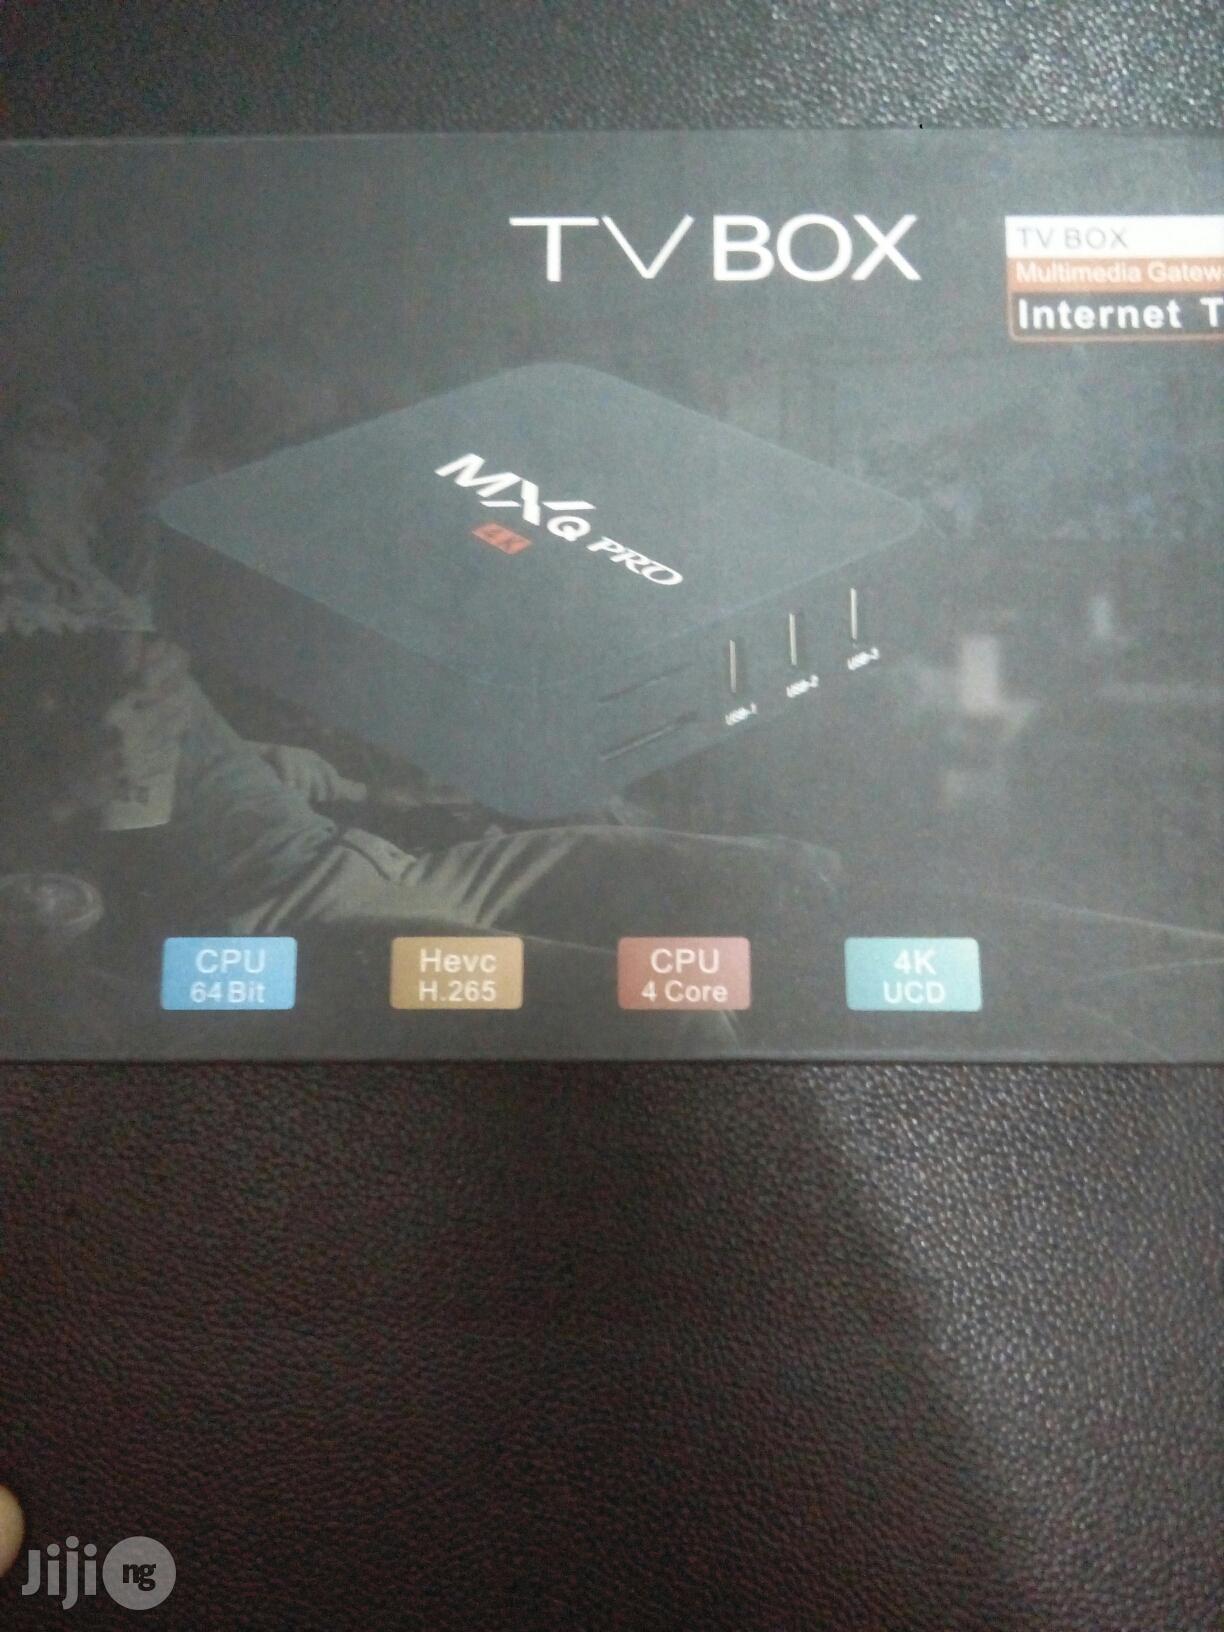 MXQ Pro 4K Smart TV Box | TV & DVD Equipment for sale in Ikeja, Lagos State, Nigeria